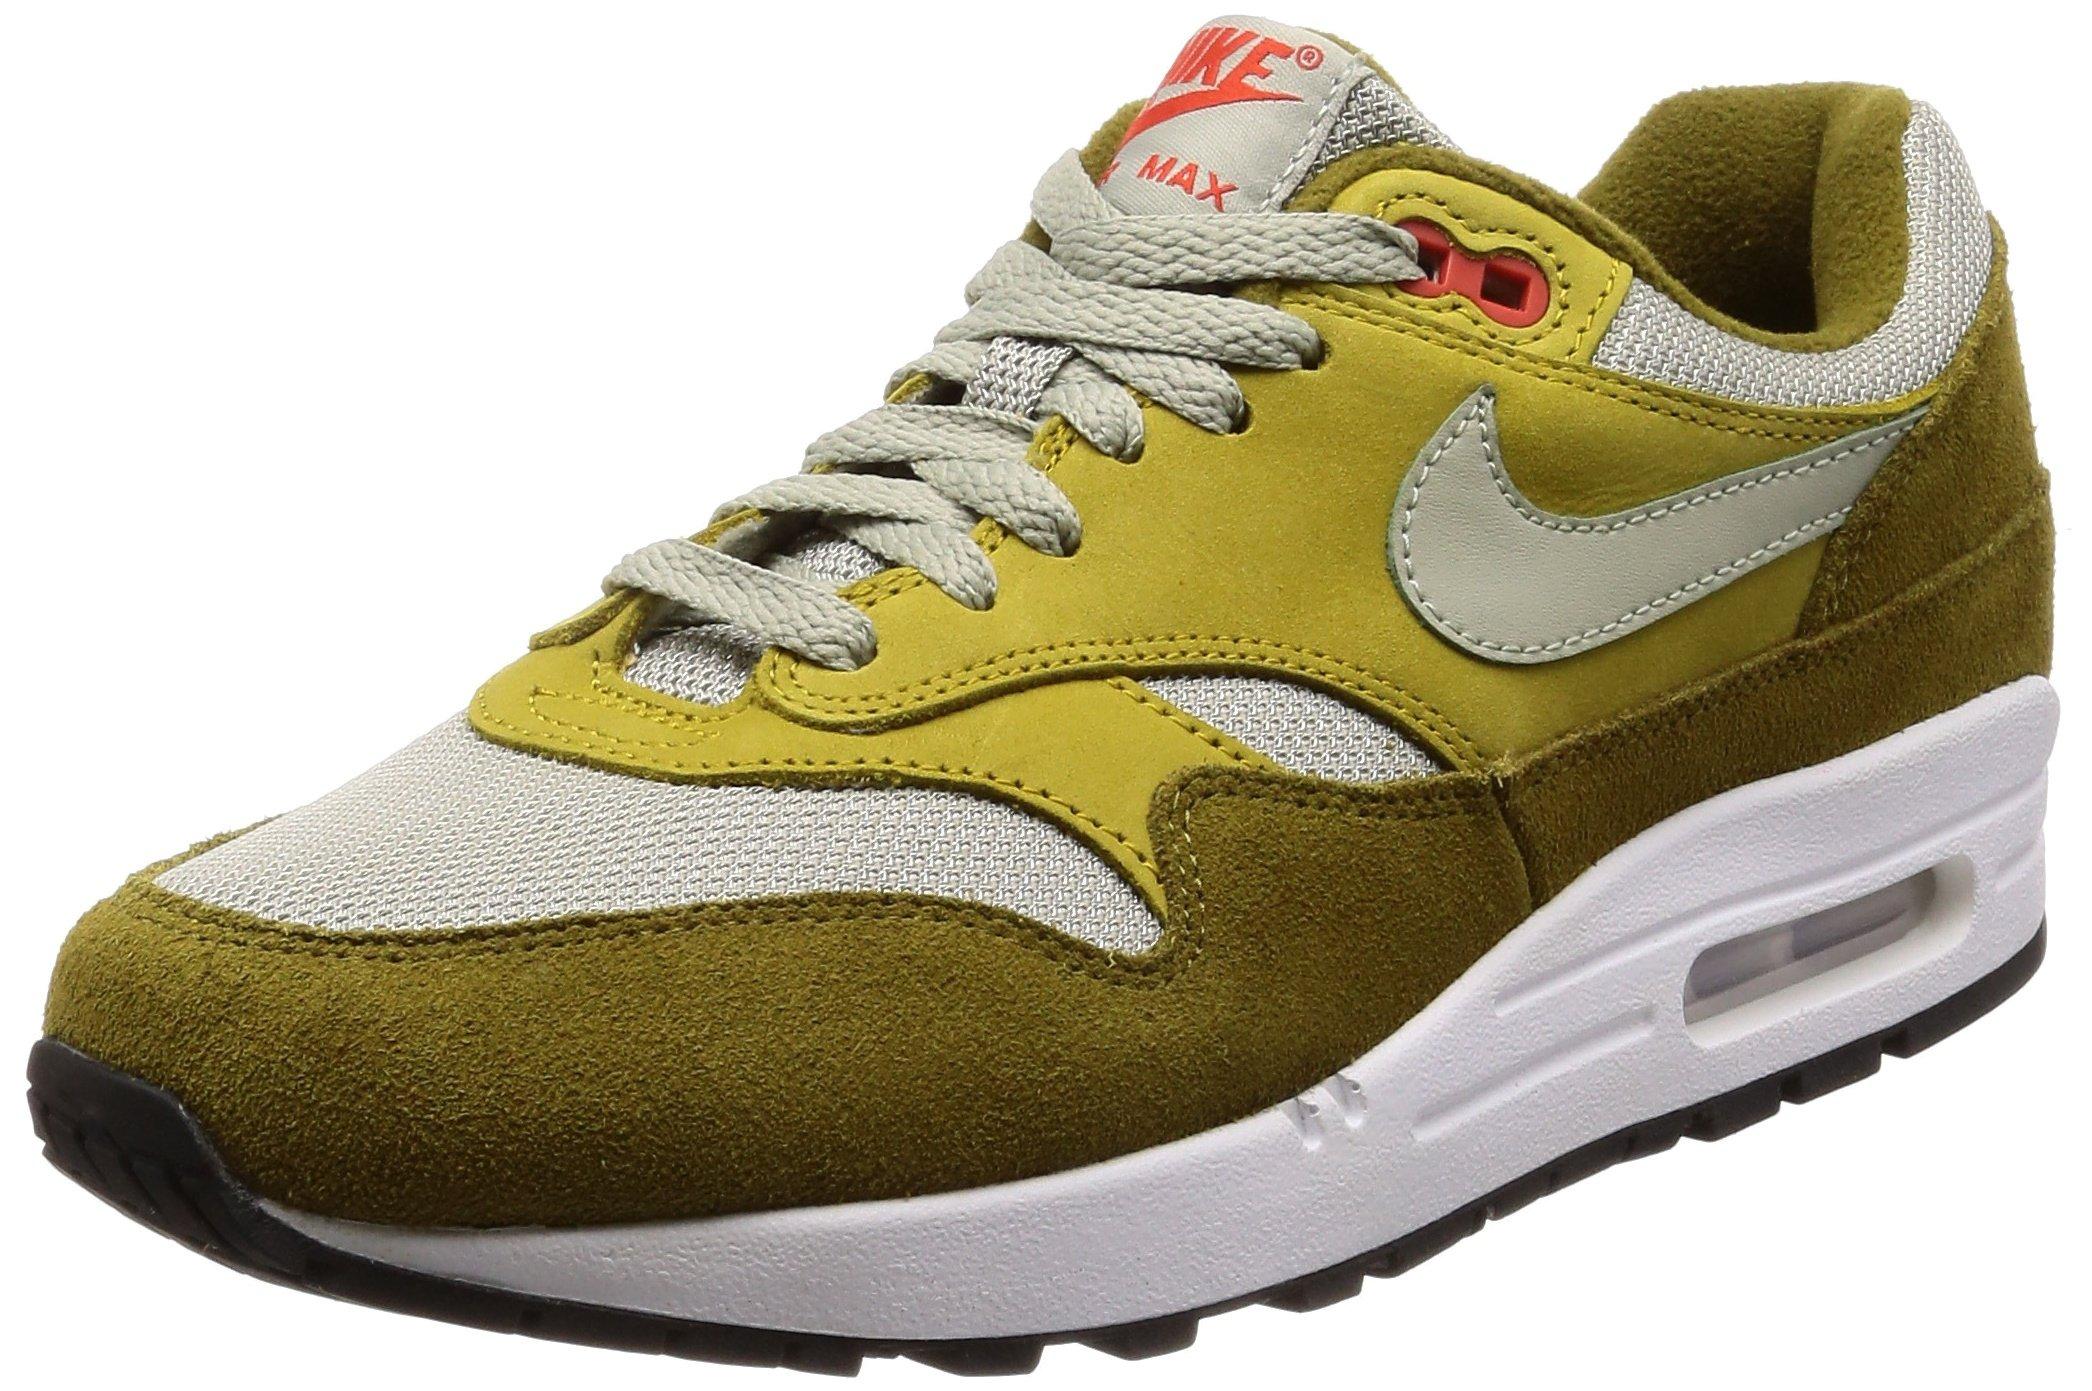 timeless design 3d3fb 73672 Galleon - Nike Men s Air Max 1 Premium Retro Basketball Shoe (9)